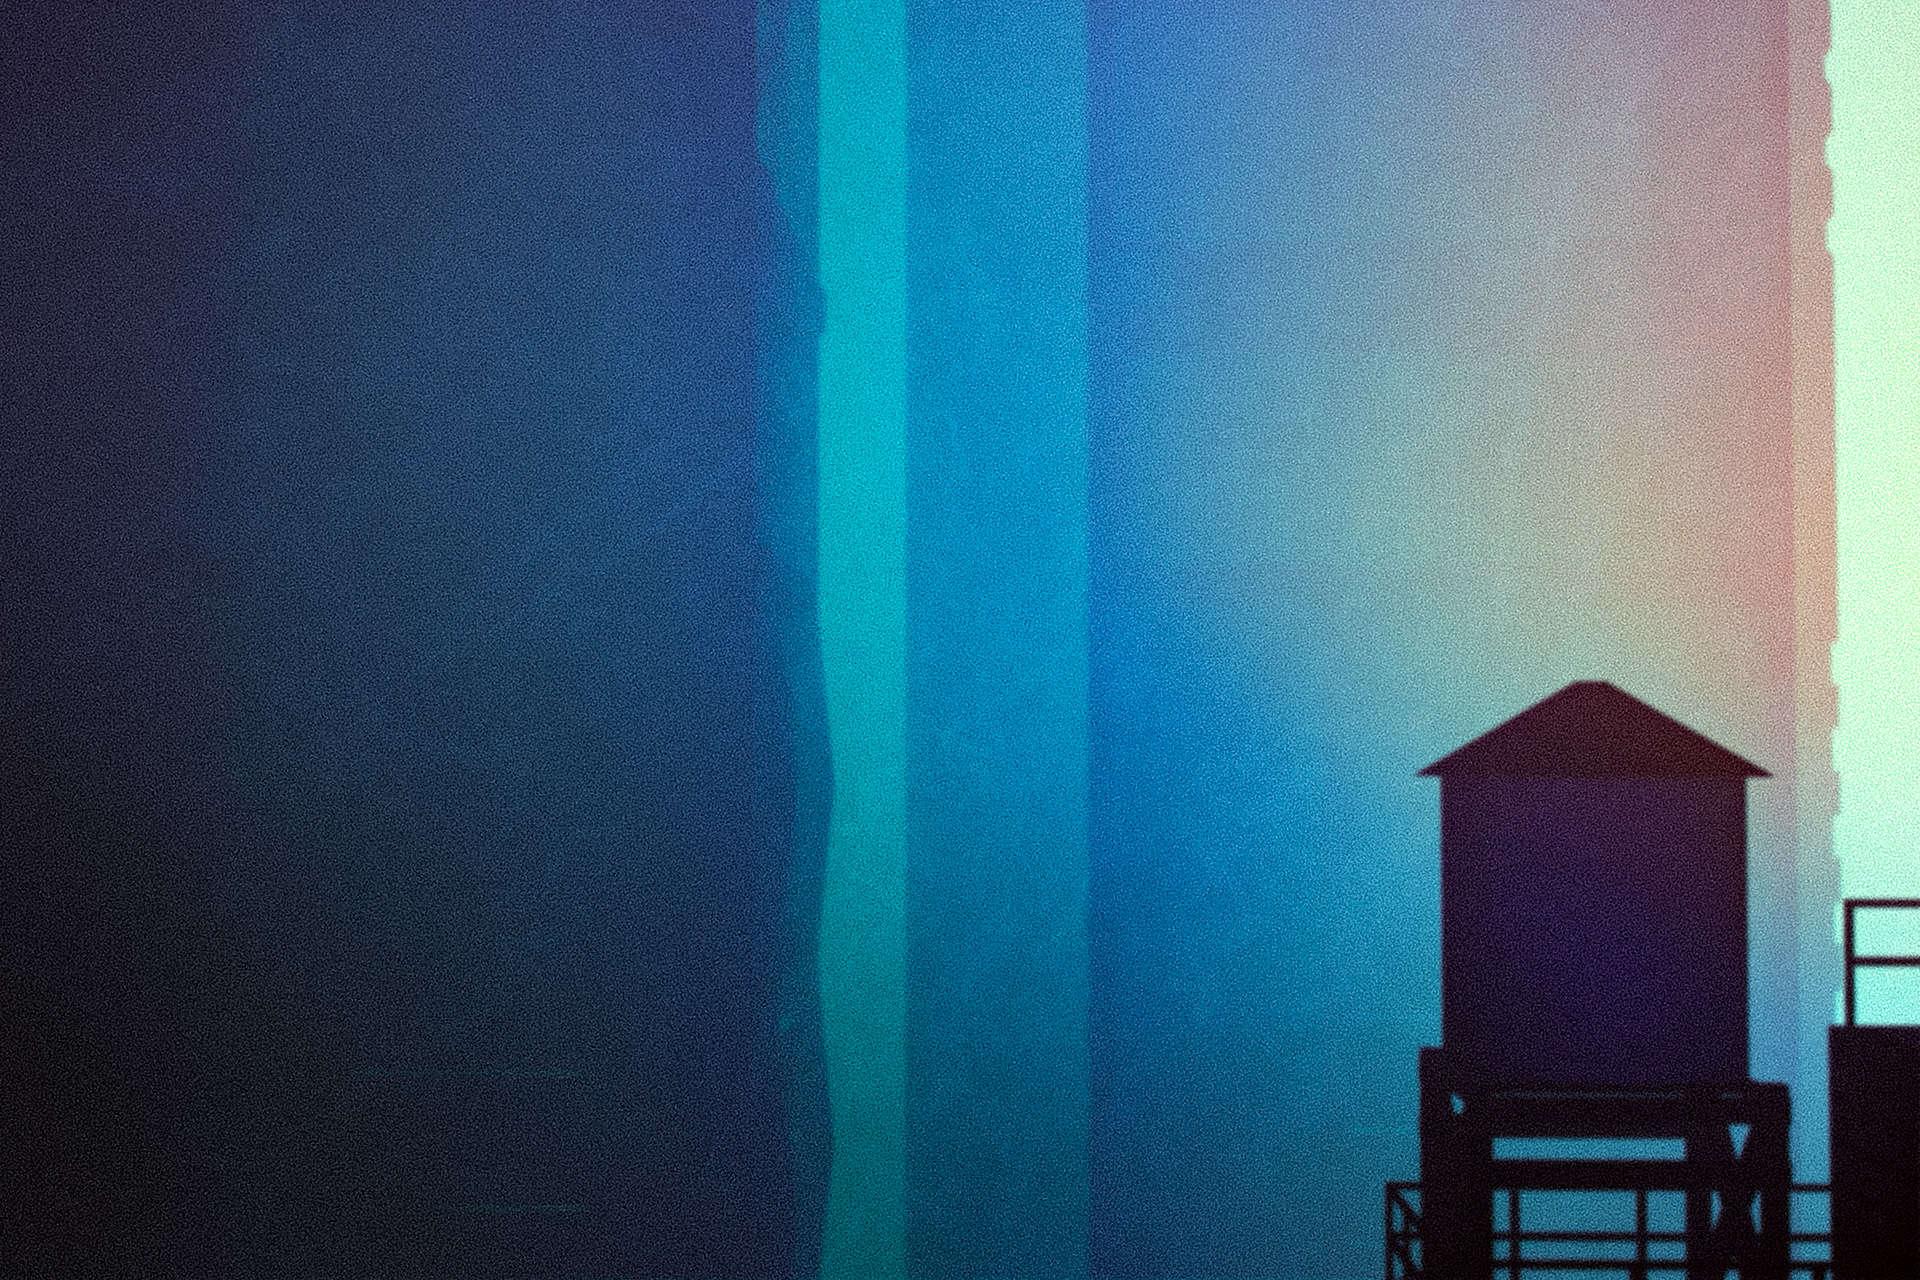 artnorama - Nightlight